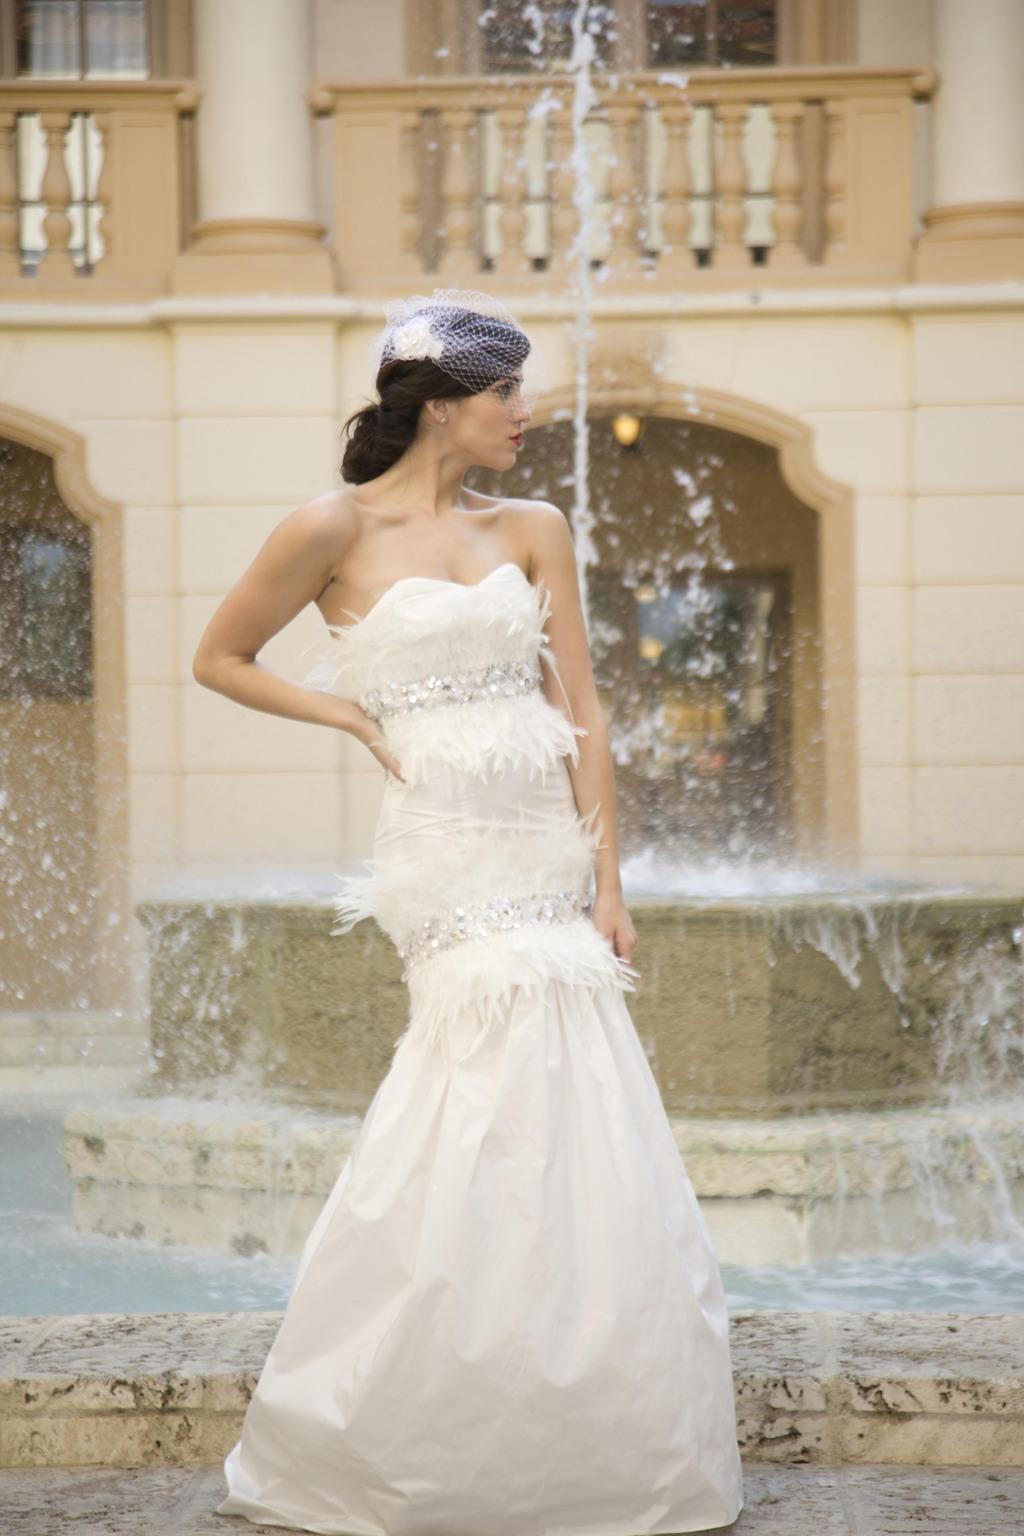 Vintage-wedding-dress-drop-waist-feathers-rhinestones-bridal-belt.full